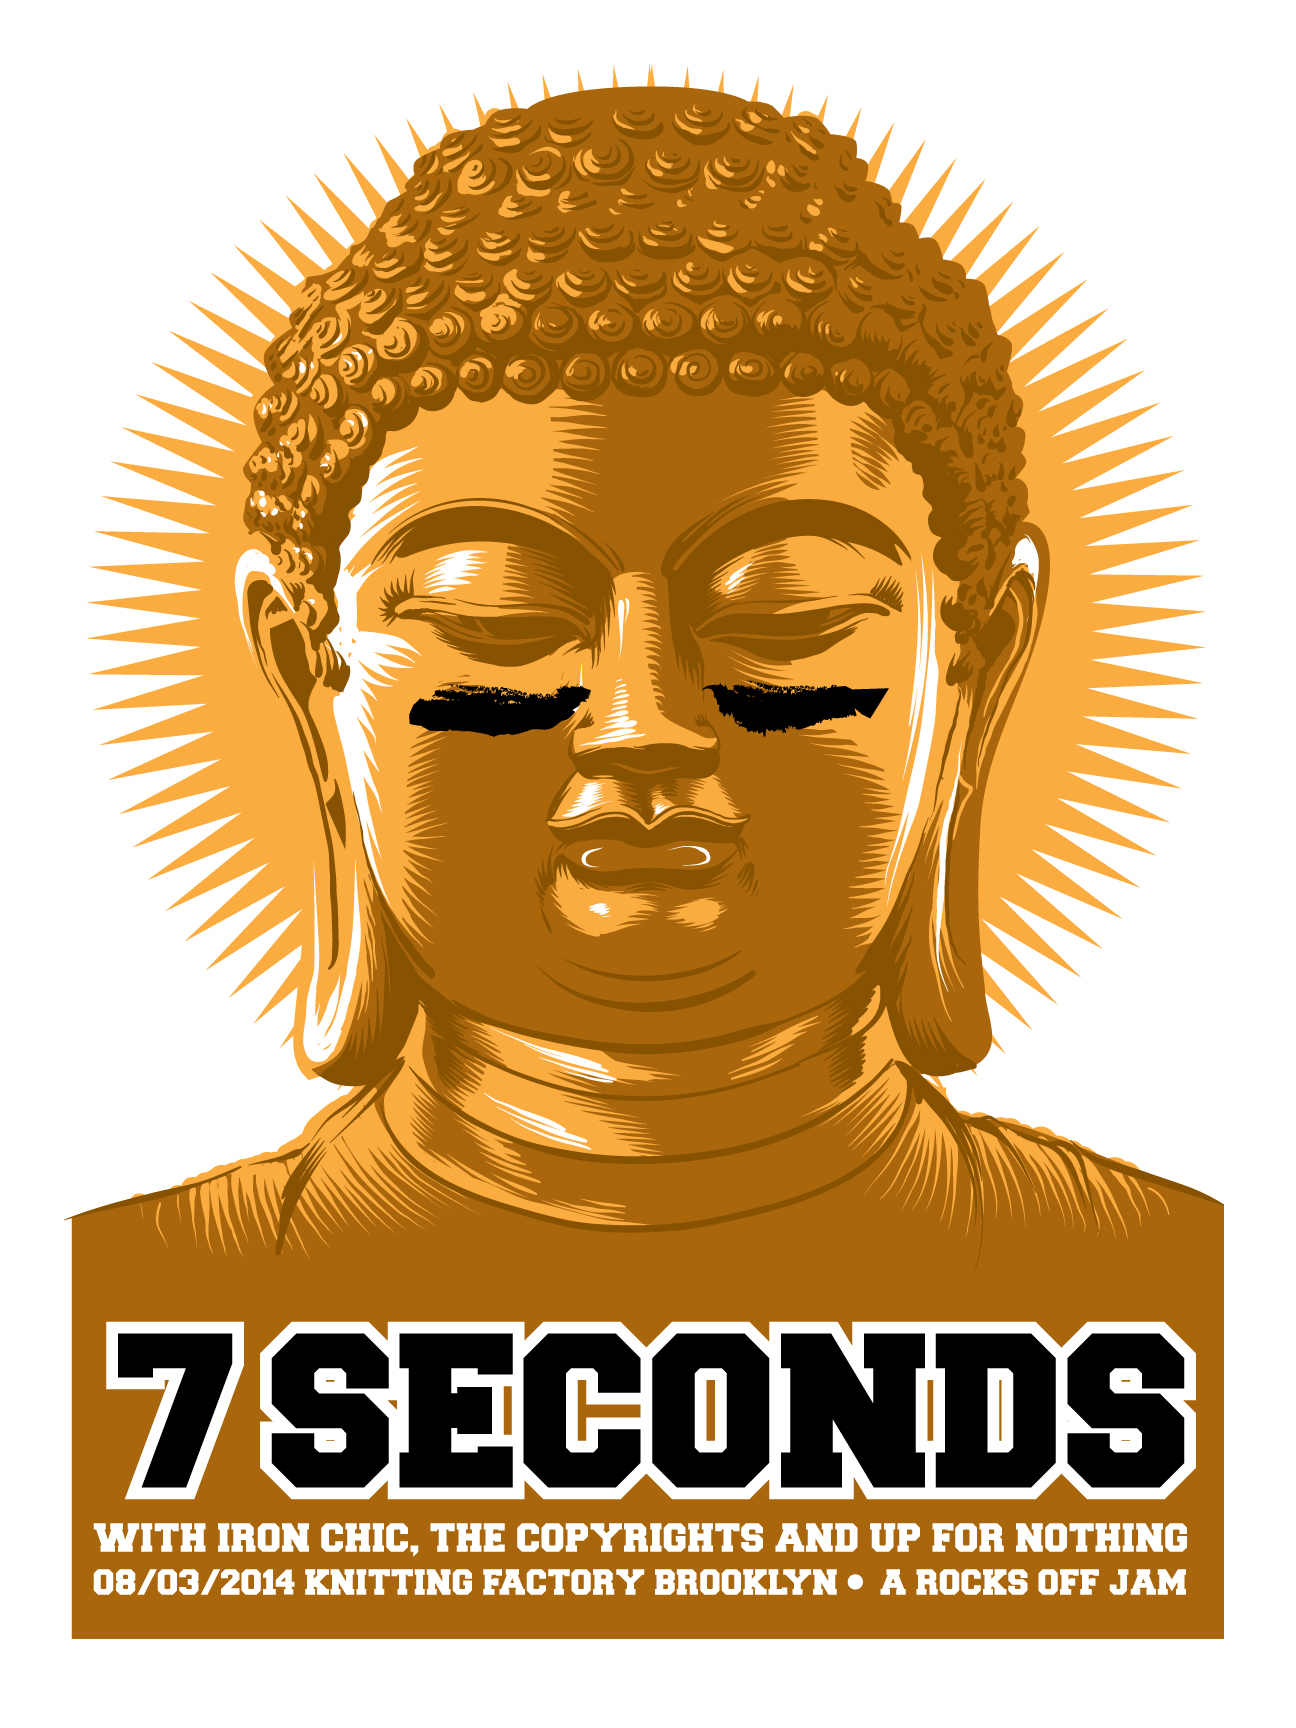 7seconds8-3-14.jpg